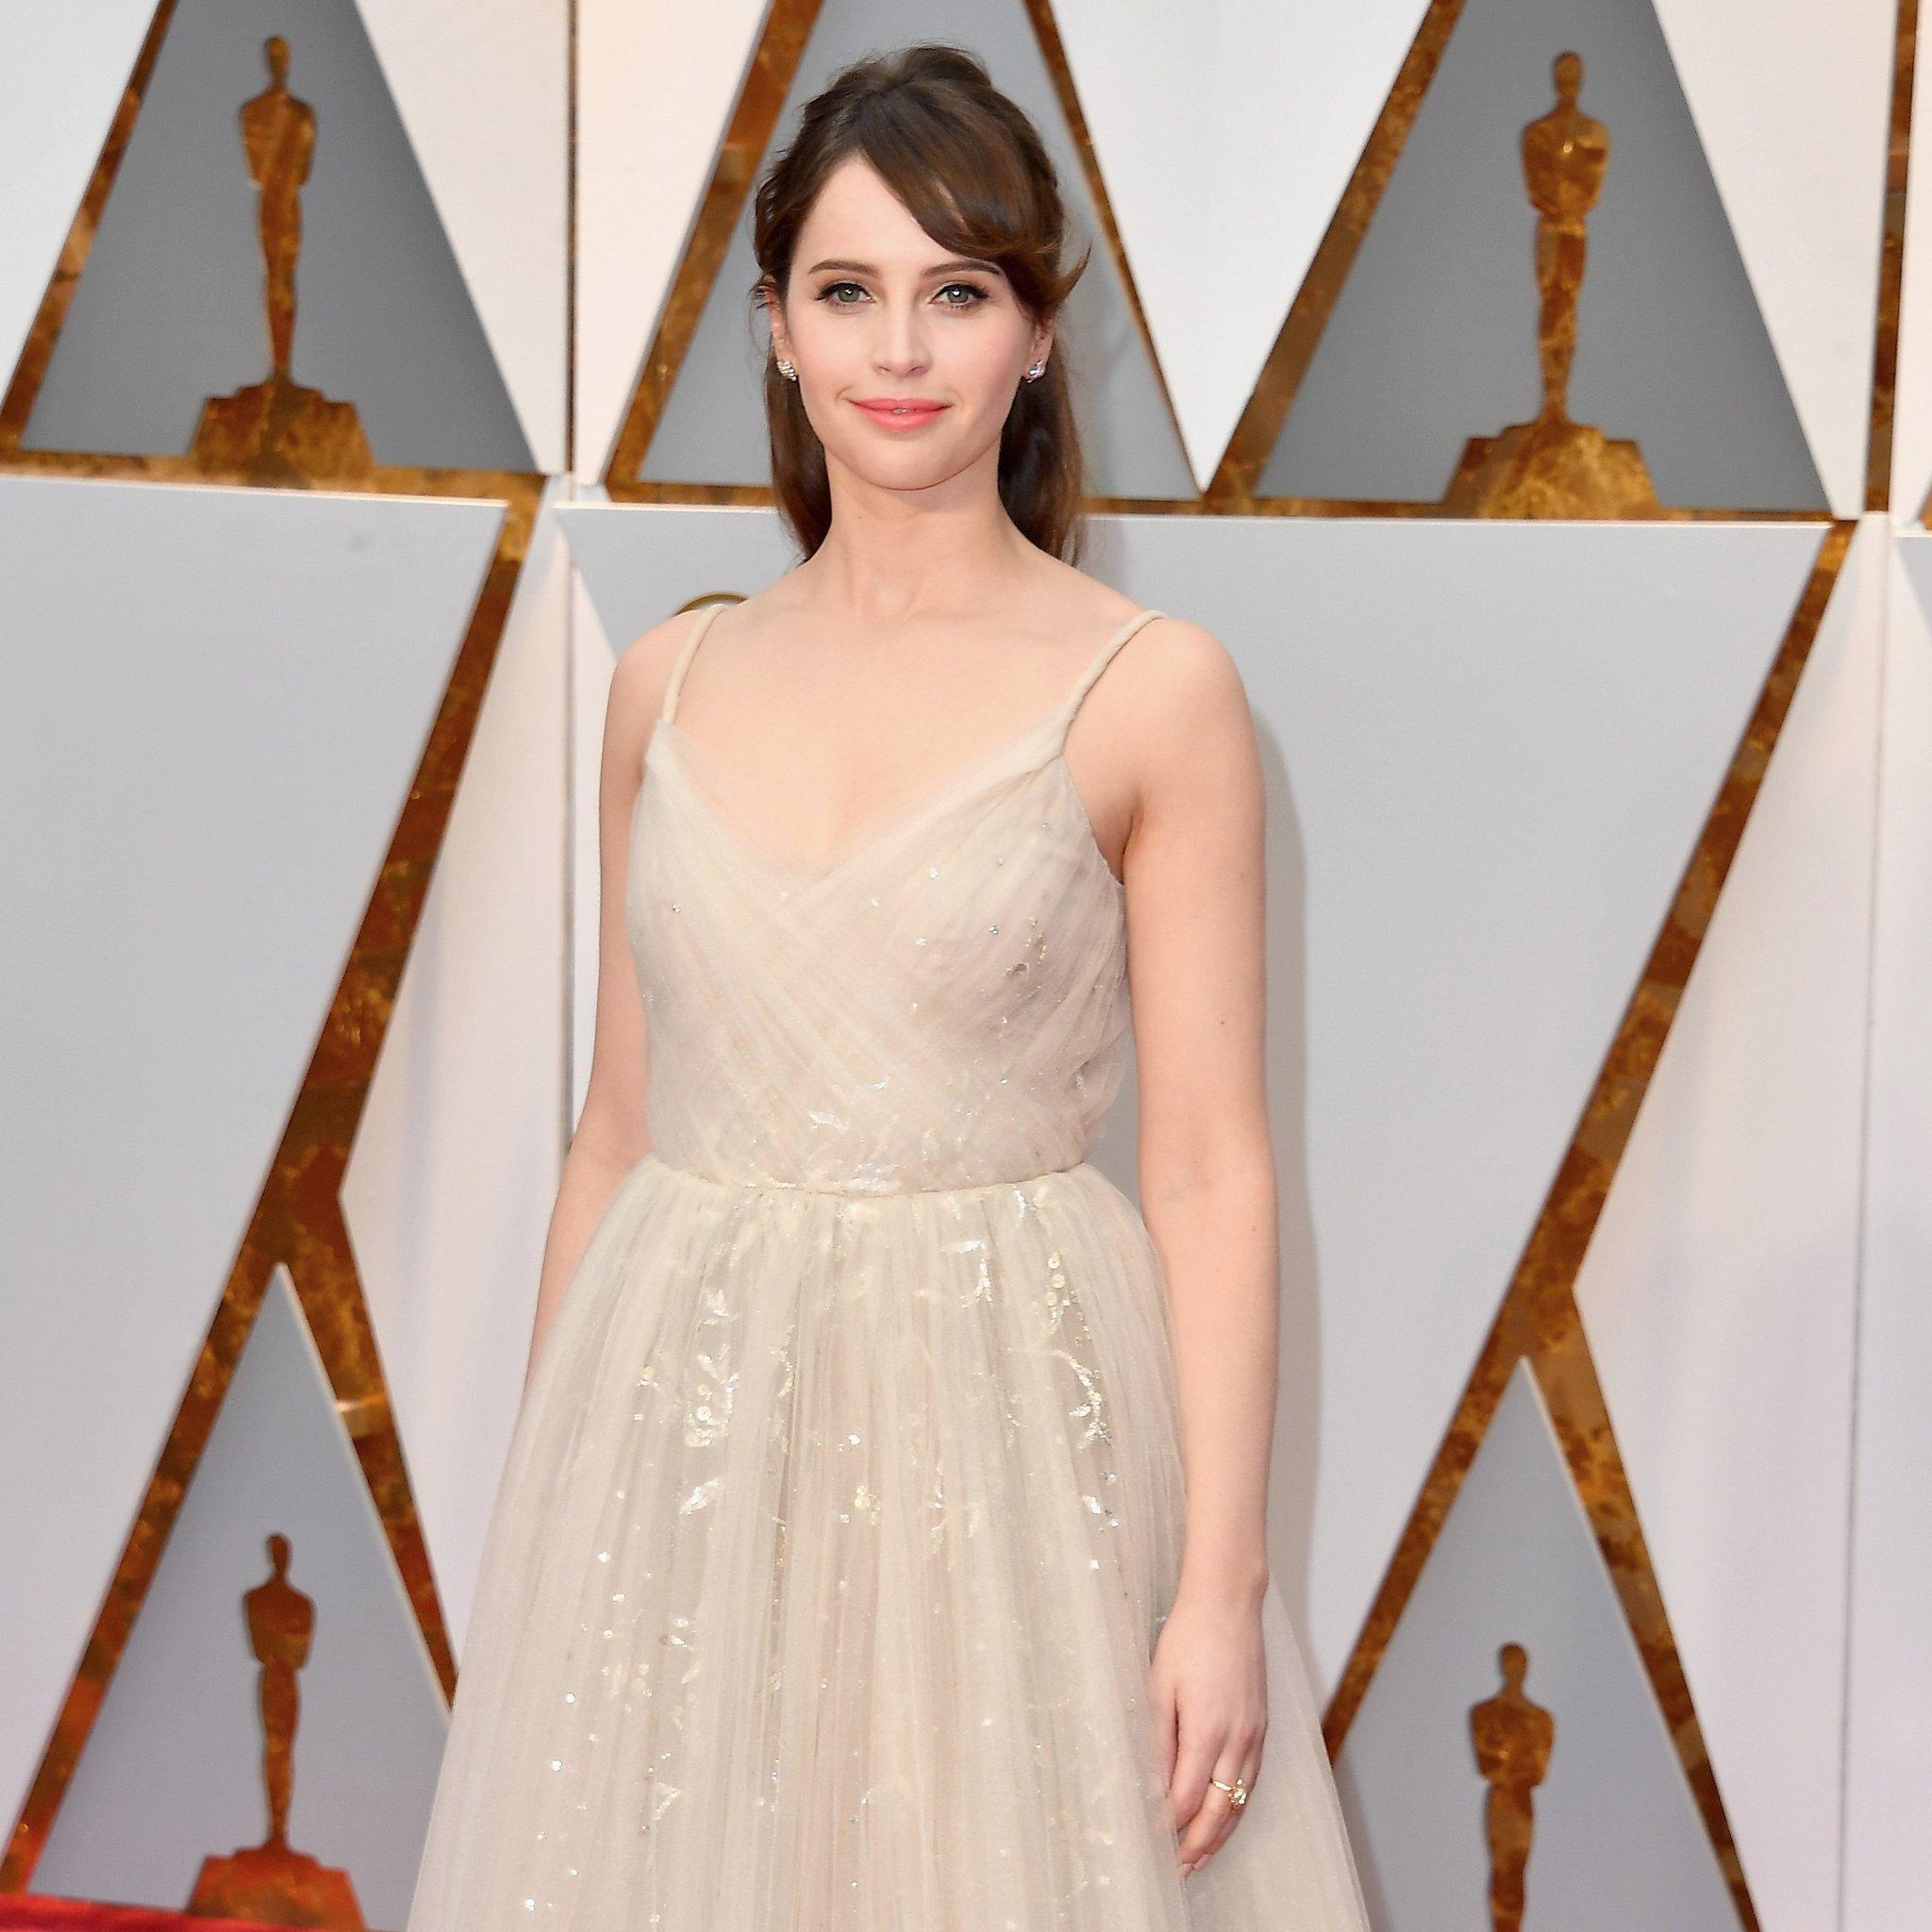 Felicity-Jones-Dior-Couture-Dress-Oscars-2017.jpg